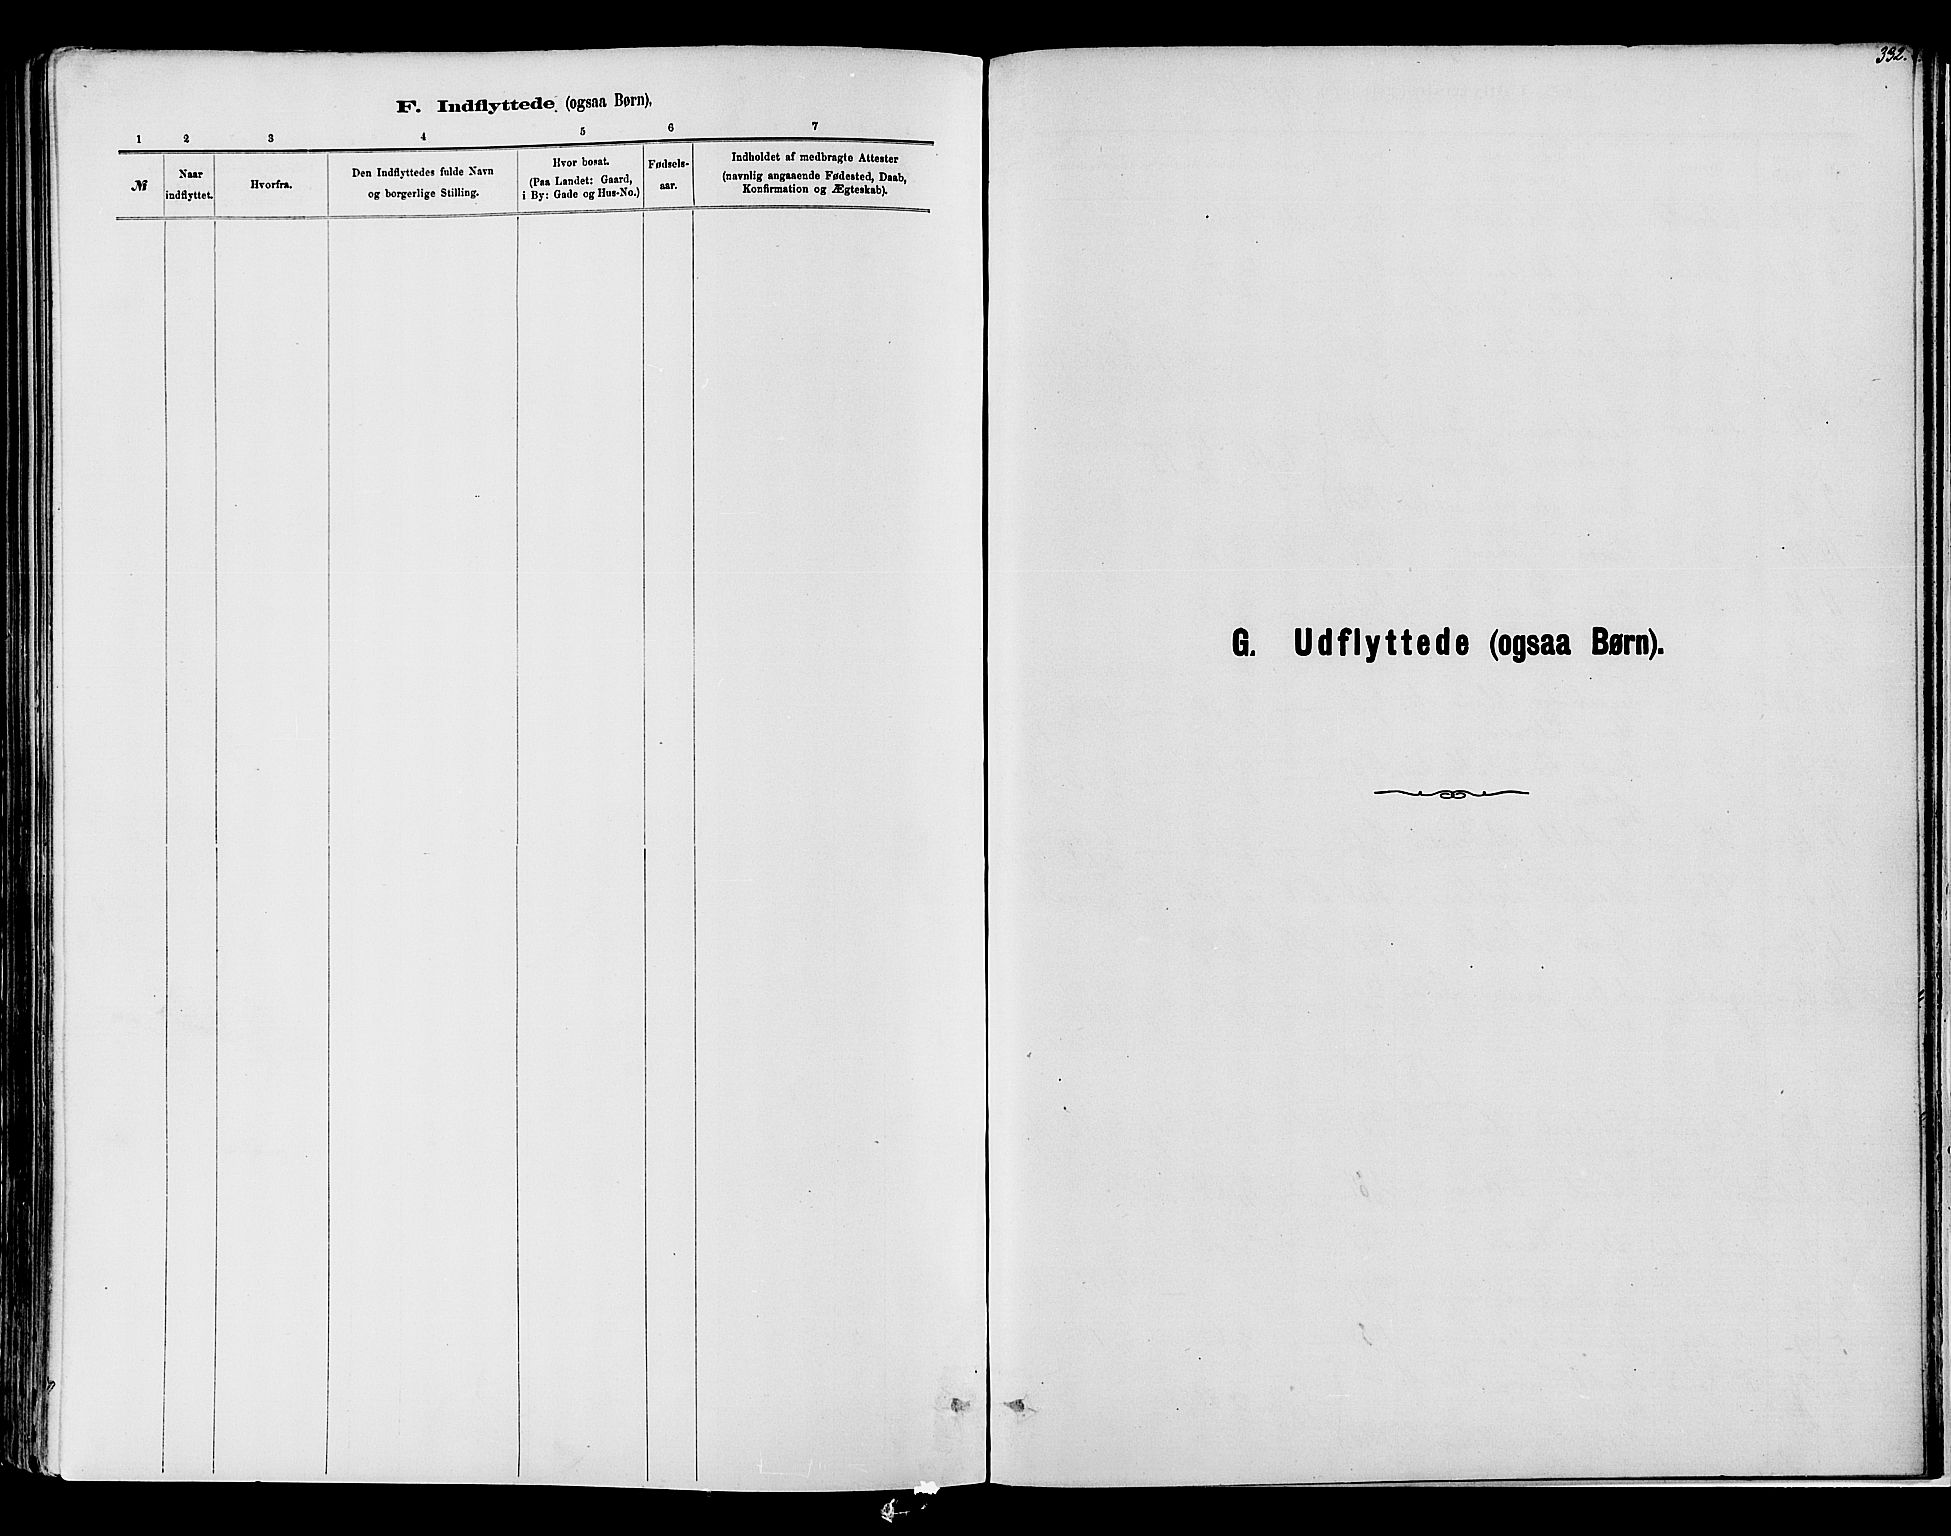 SAH, Vardal prestekontor, H/Ha/Haa/L0008: Ministerialbok nr. 8, 1878-1890, s. 332